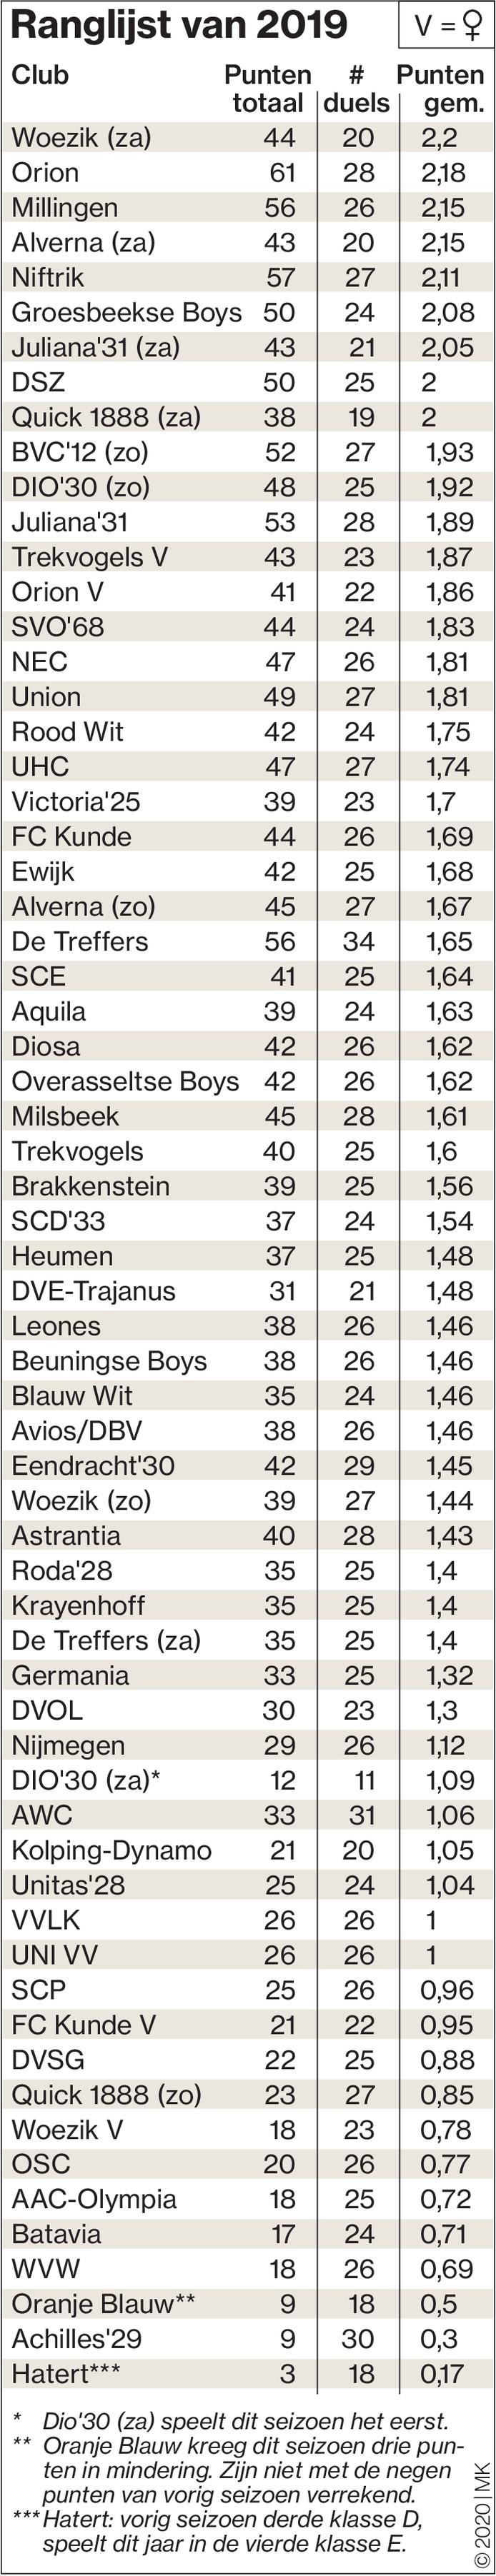 3384, infographic, Marcel, Kuster, ranglijst voetbal, amateurvoetbal, Nijmegen